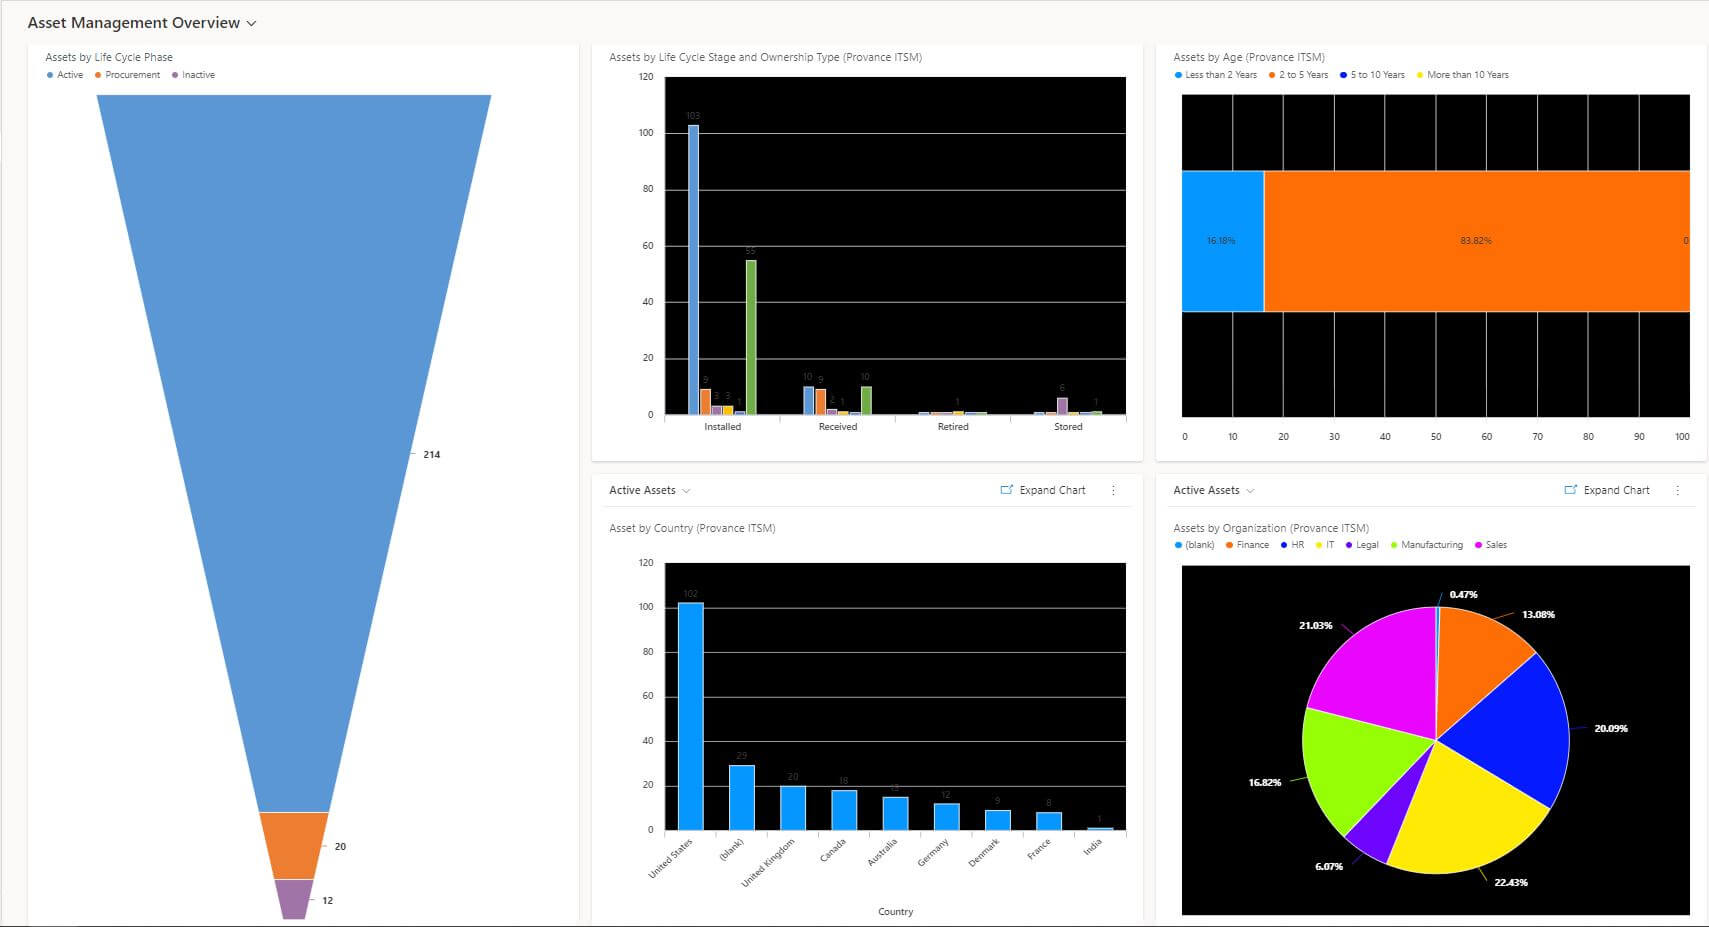 ITAM Overview Dashboard Screenshot